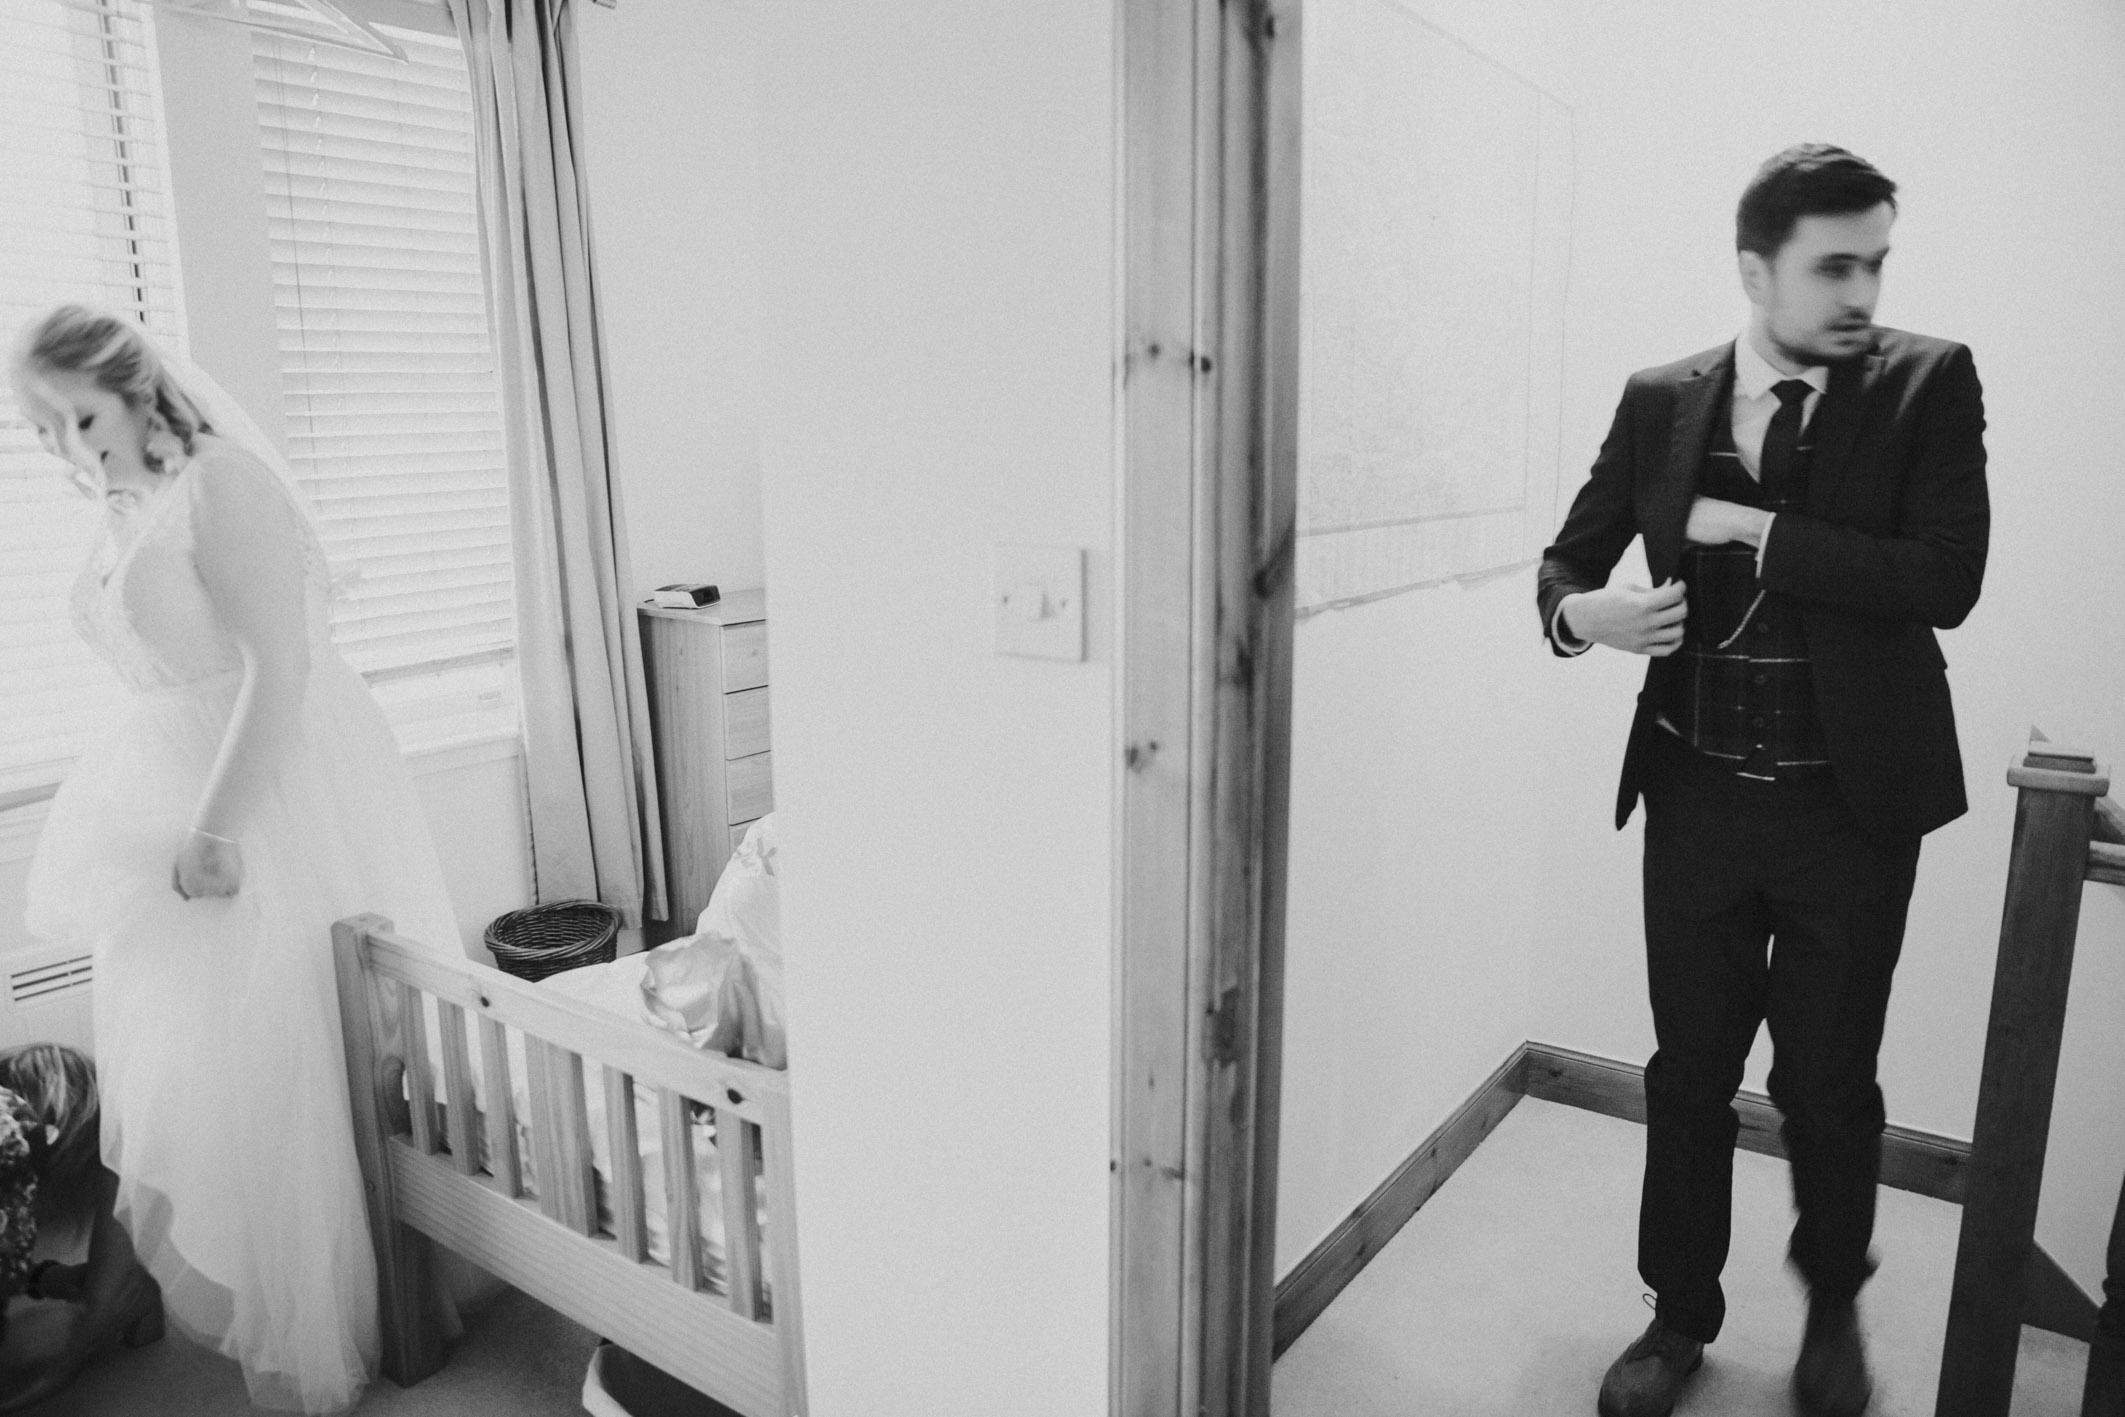 Dornoch Wedding Photography | Scottish Photographer | Alternative Photos | Ceranna Photography | intimate elopement |